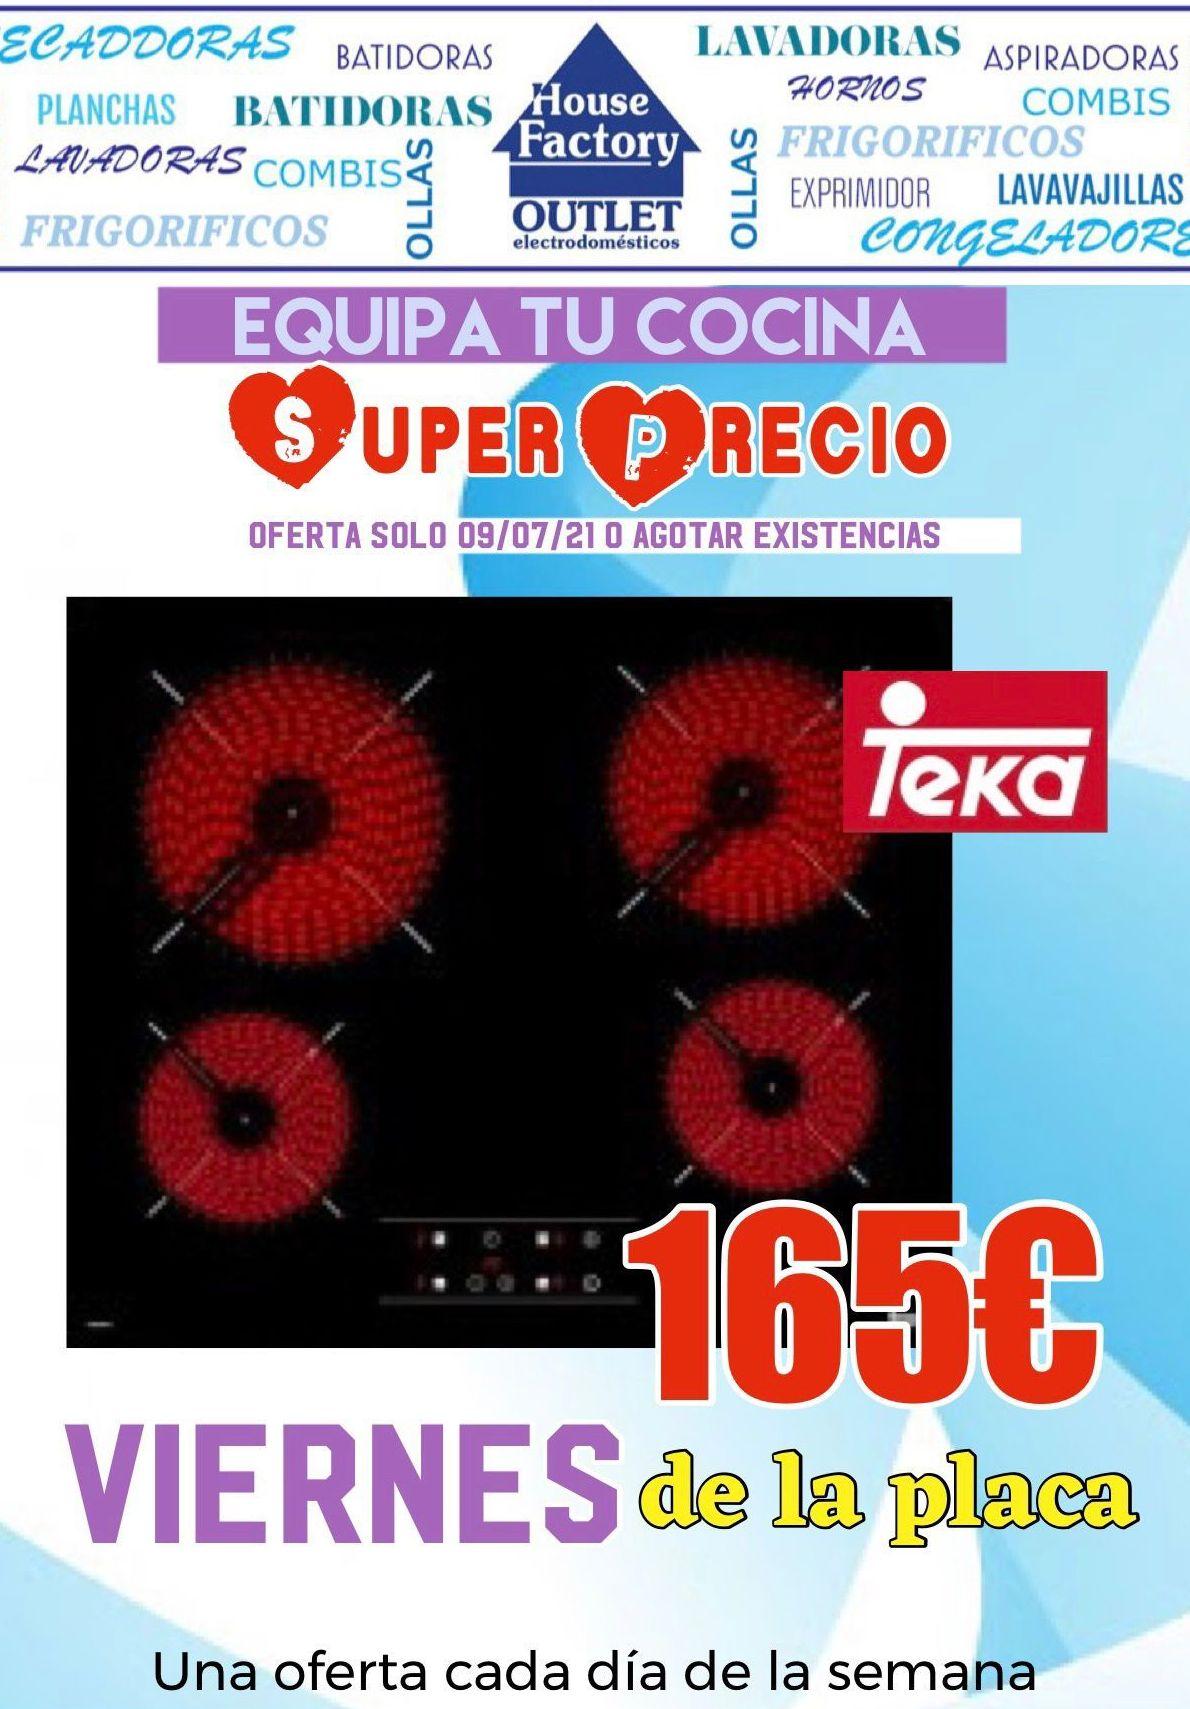 Foto 1 de Outlet de electrodomésticos en  | House Factory Madrid Outlet de Electrodomésticos Paseo de Extremadura